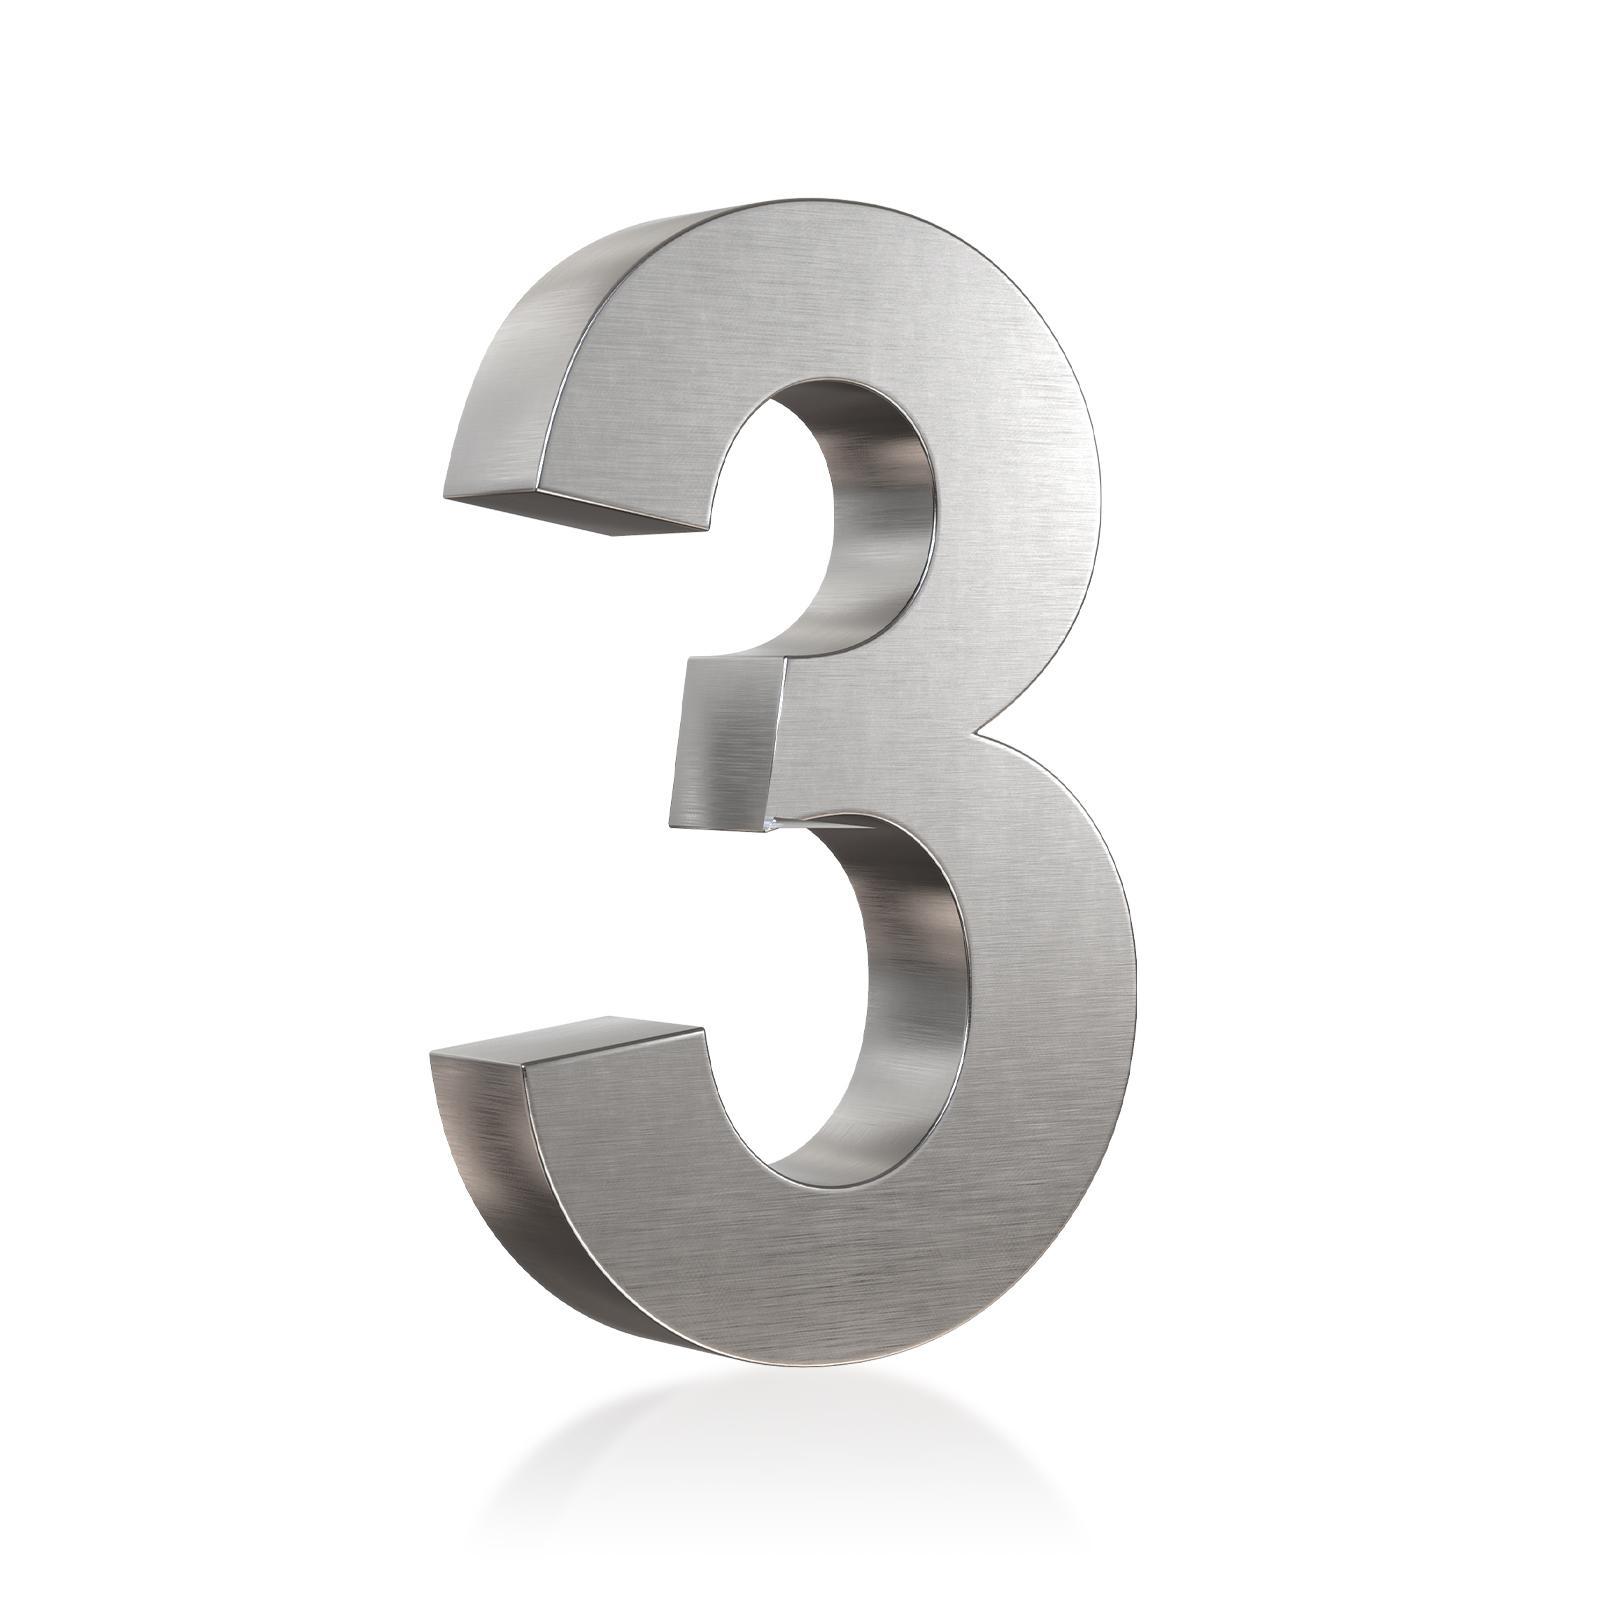 3D Hausnummer 3 Edelstahl in 3D Design Arial V2A